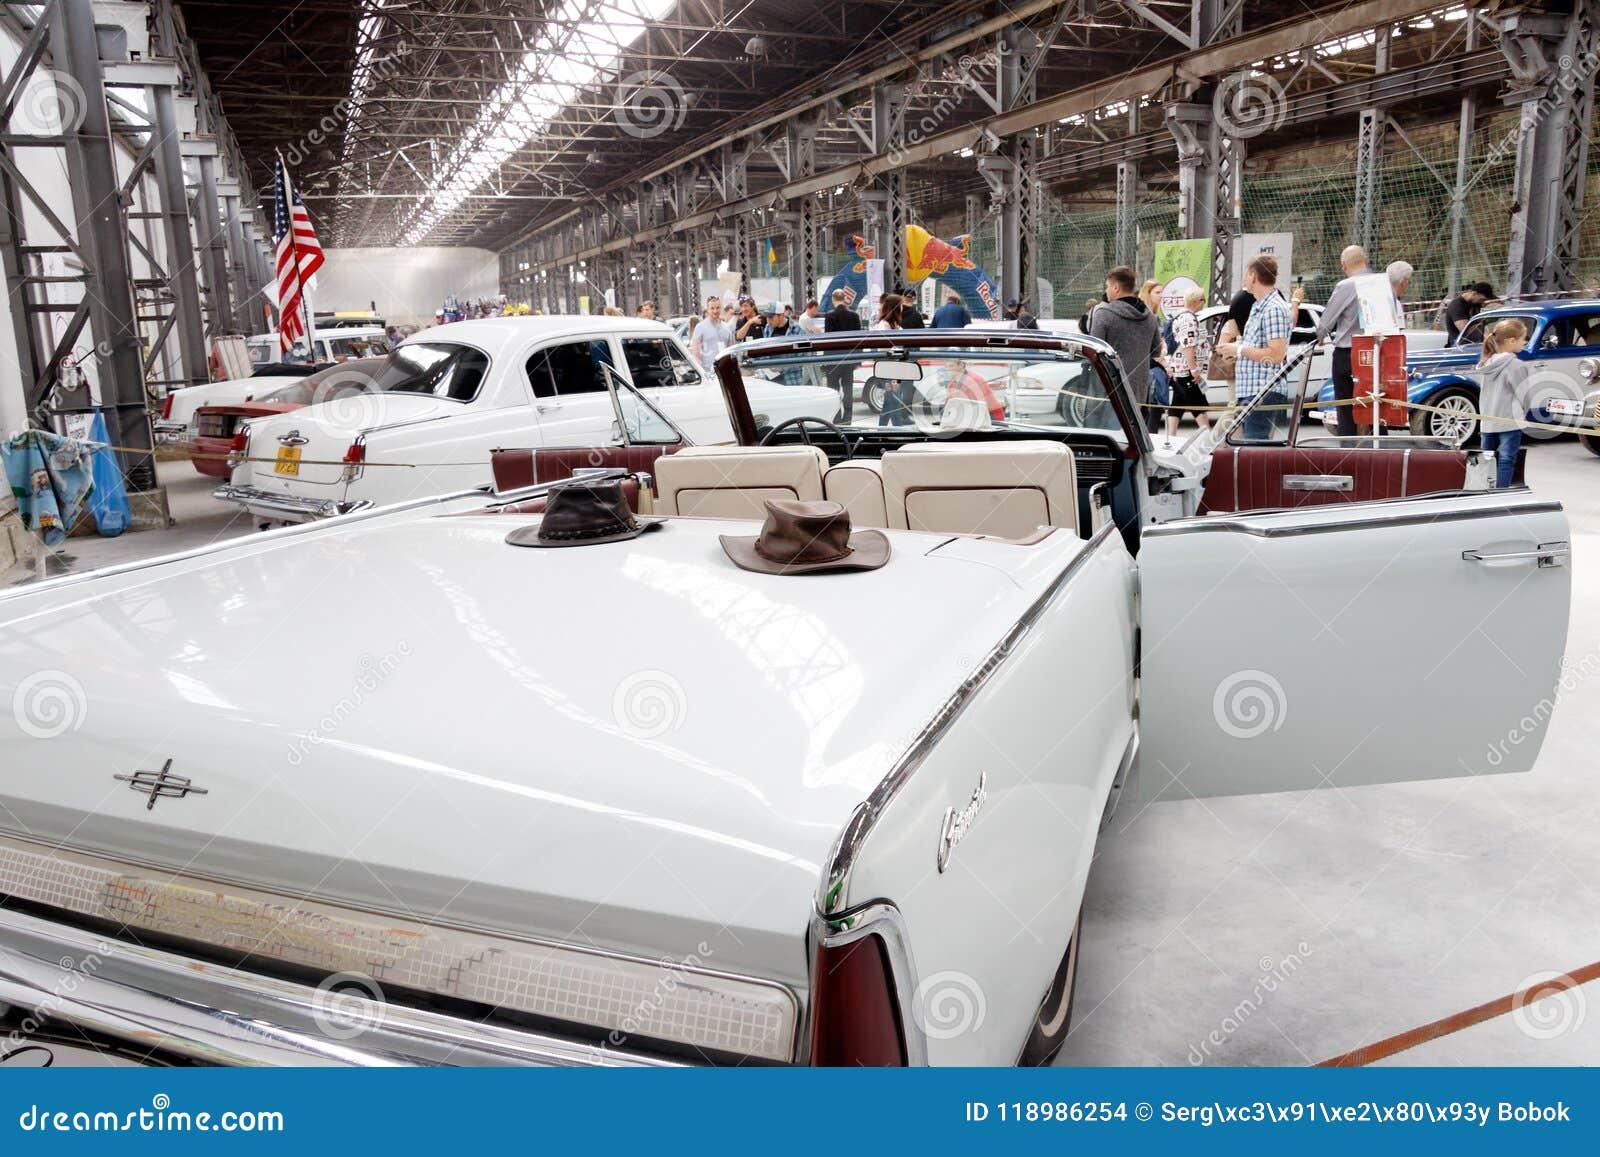 Lincoln Continental Cabrio Vintage Car Stock Image Editorial Stock